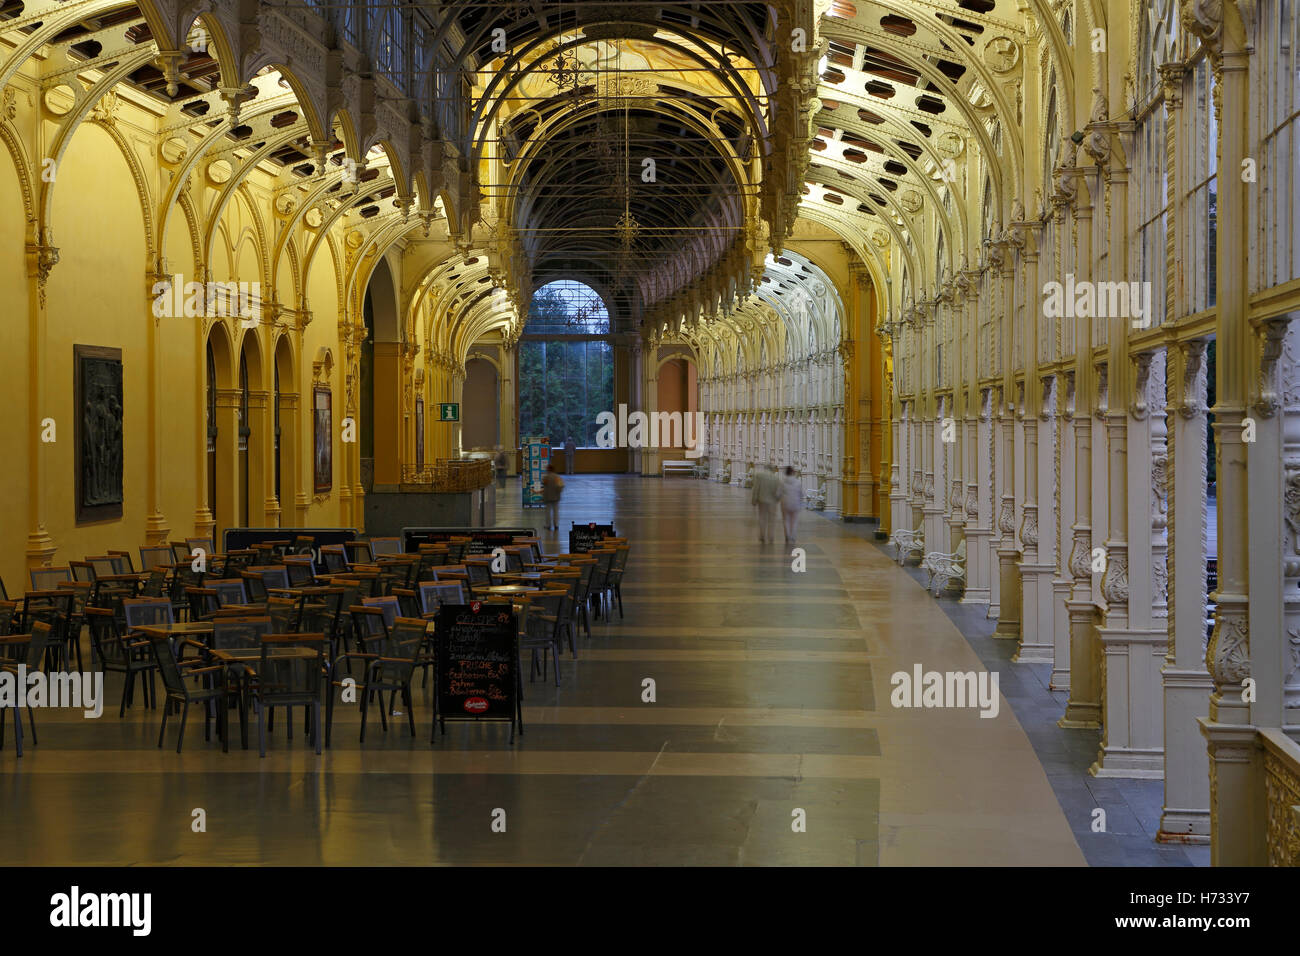 Day shot, new building, new colonnade, Nová kolonáda, main colonnade, Marianske Lazne, Karlovy Vary region, - Stock Image